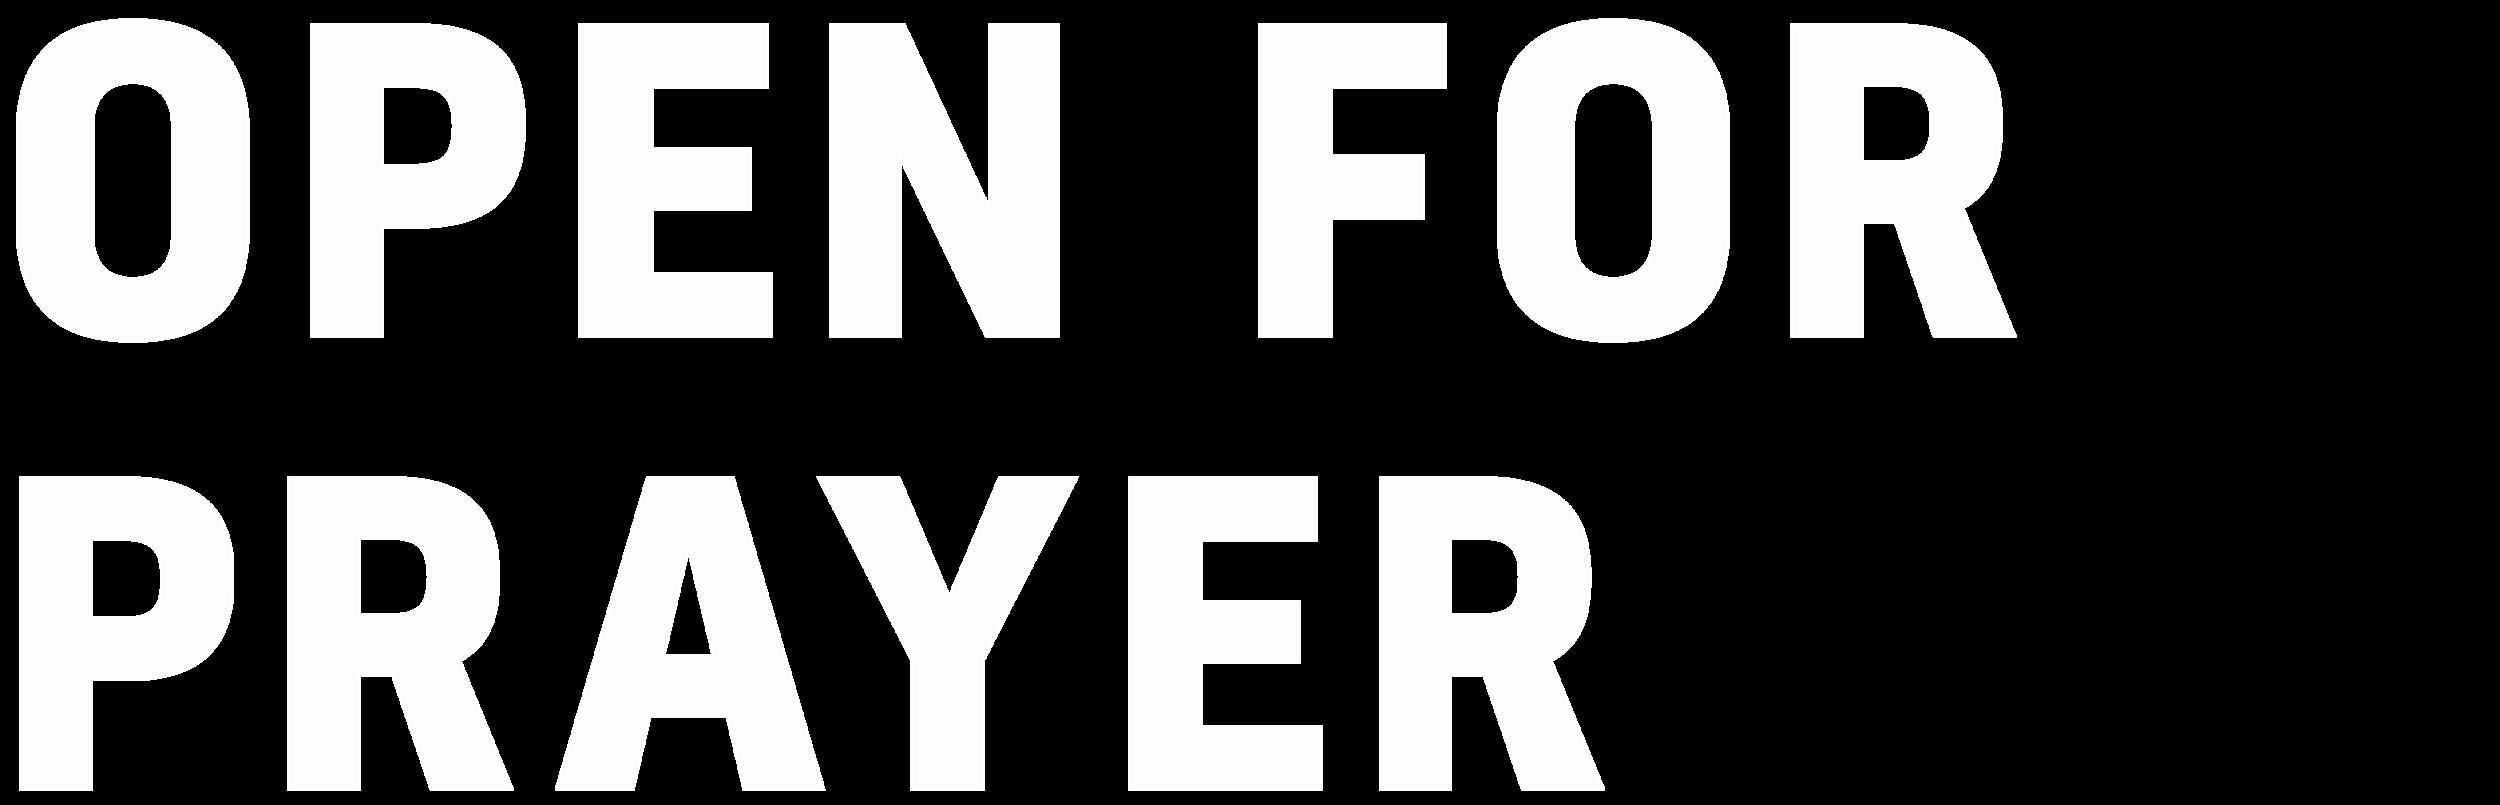 We're open for prayer Monday through Friday!